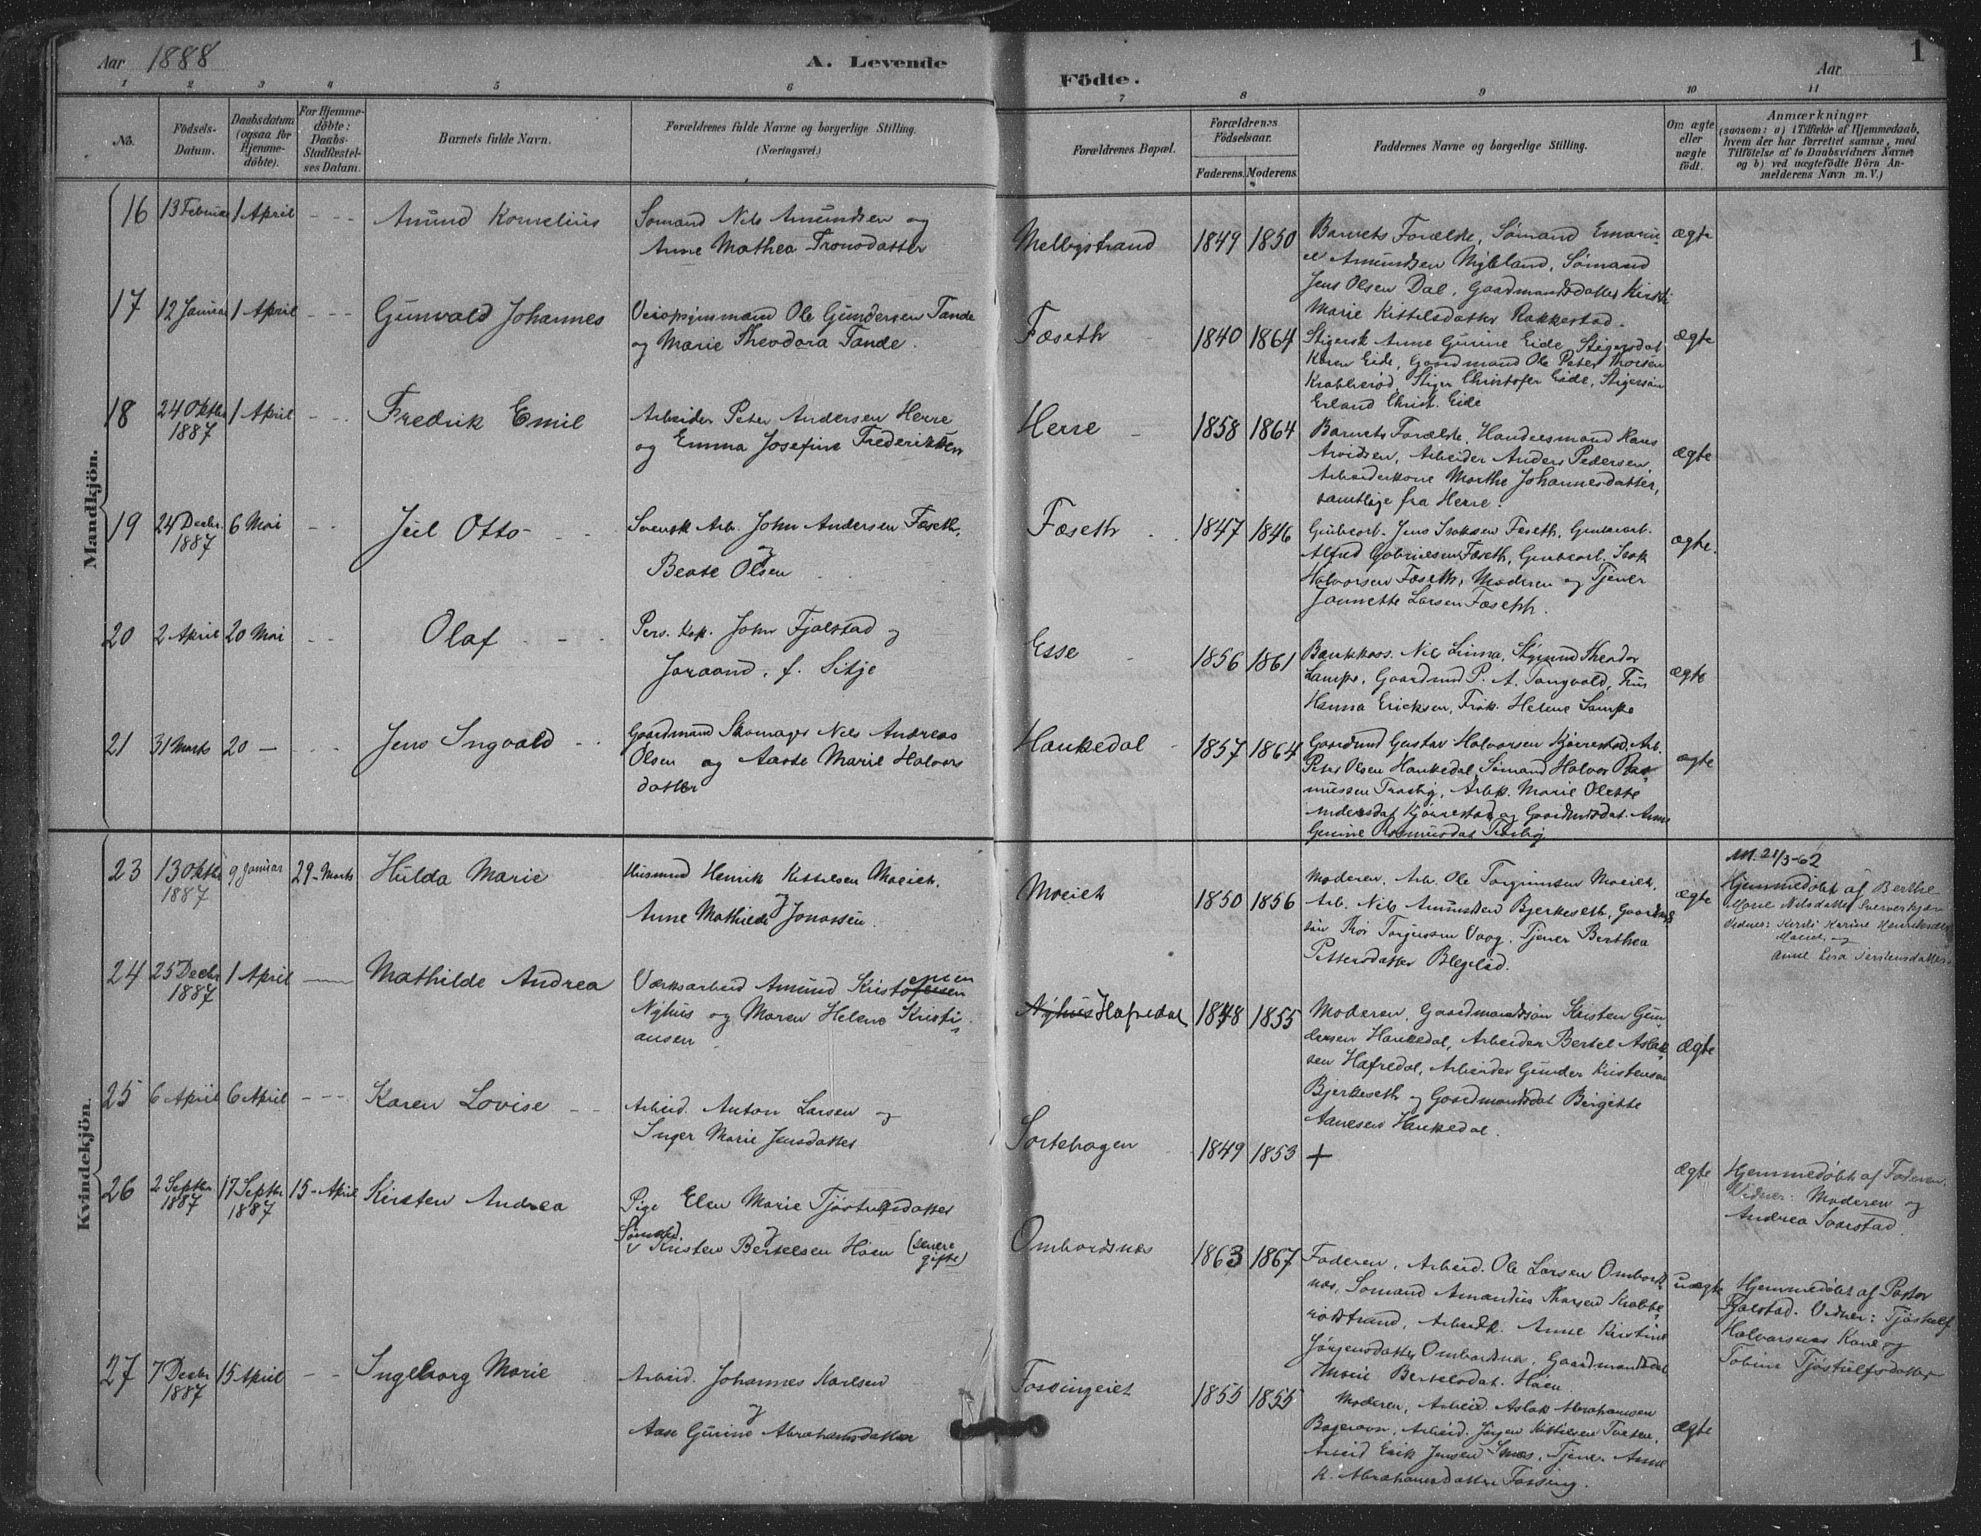 SAKO, Bamble kirkebøker, F/Fa/L0008: Ministerialbok nr. I 8, 1888-1900, s. 1